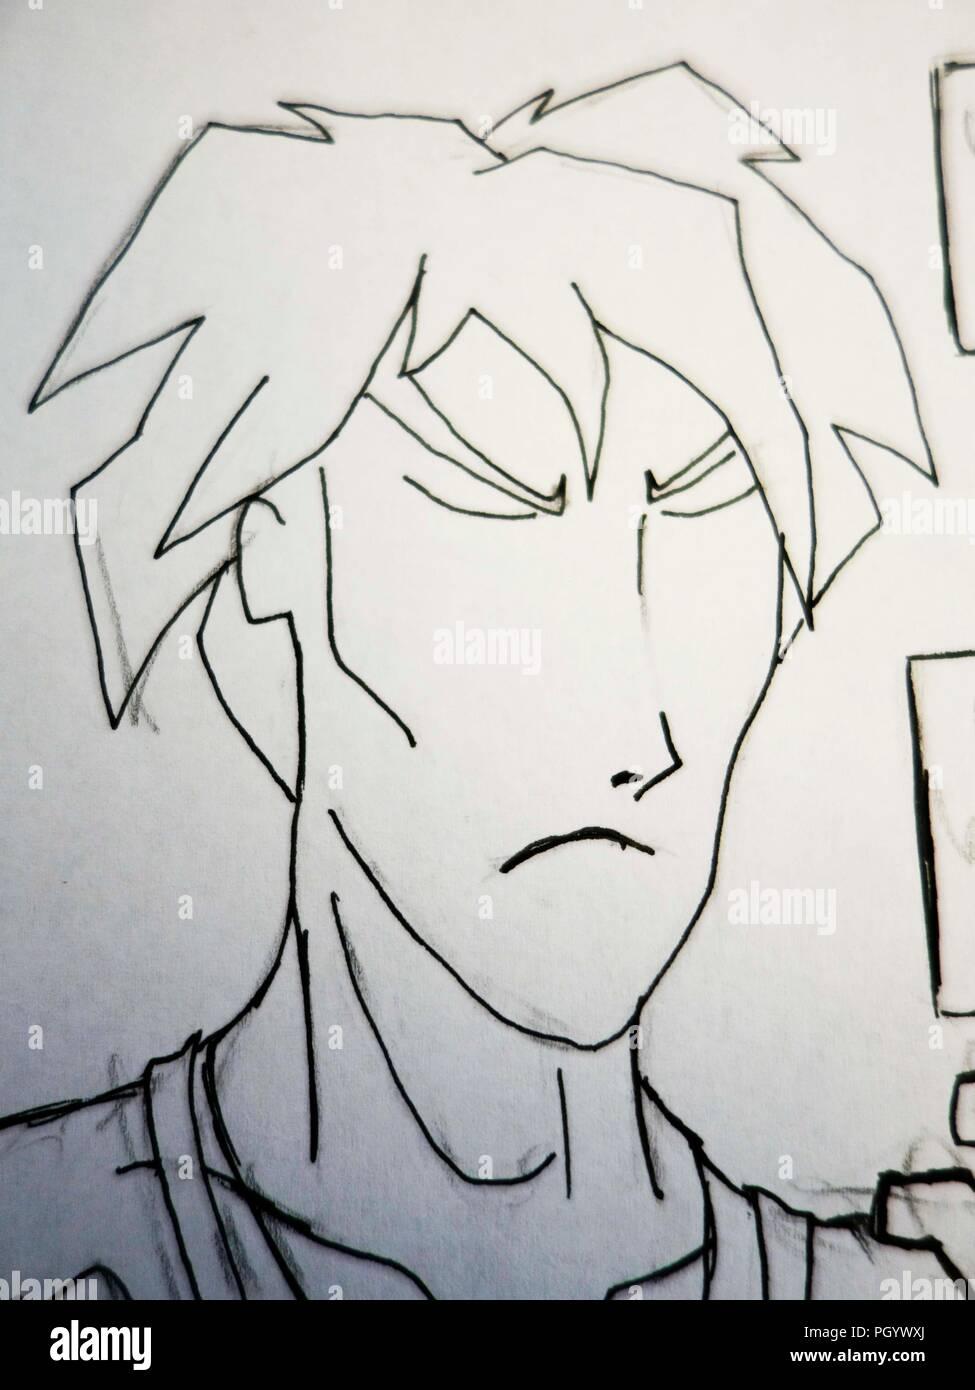 Anime Charakter Zeichnen Stockfoto Bild 216971962 Alamy